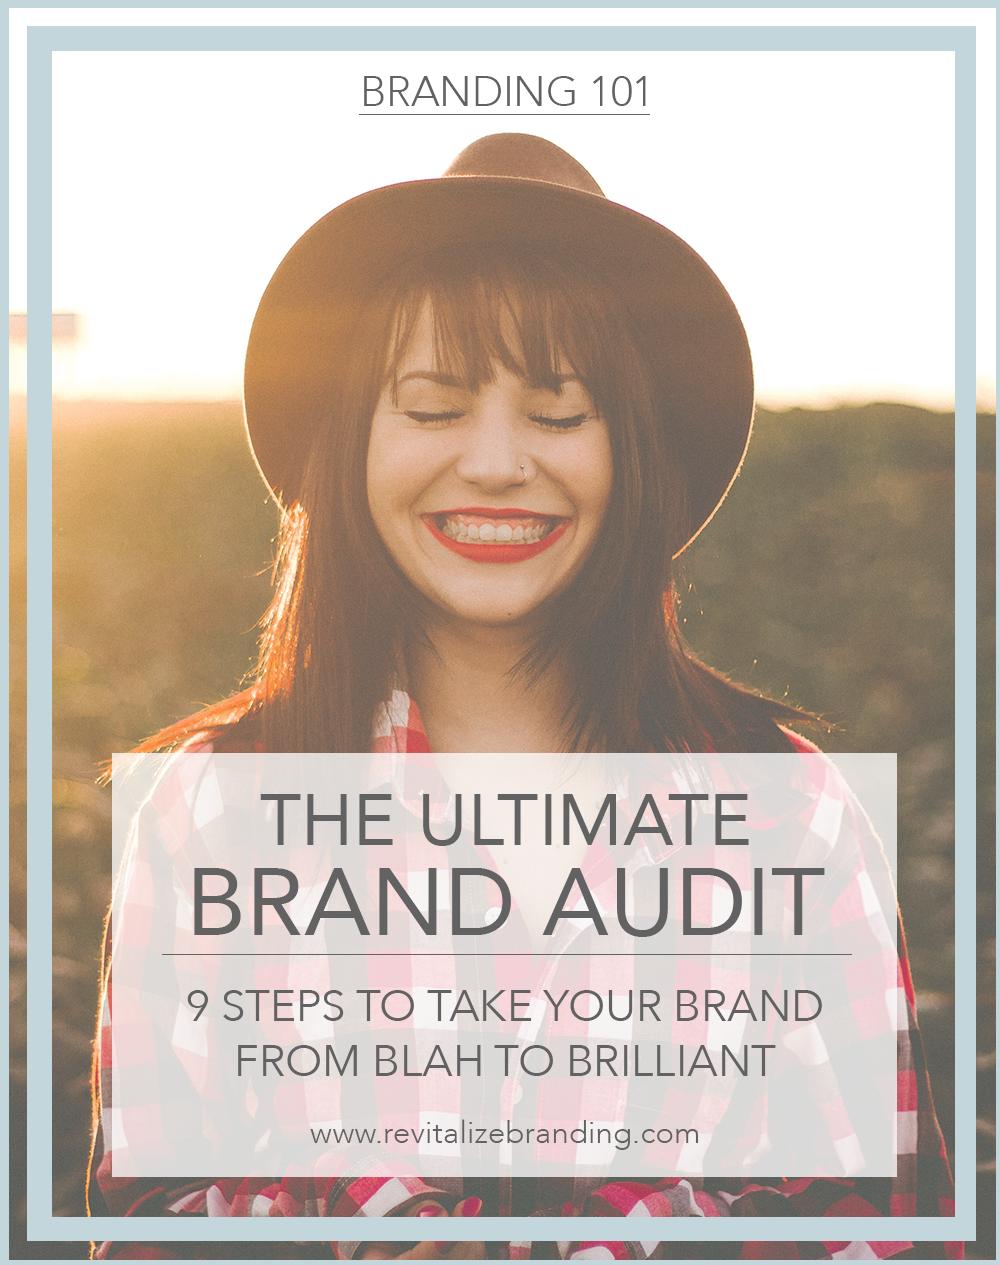 The Ultimate Brand Audit - Revitalize Branding